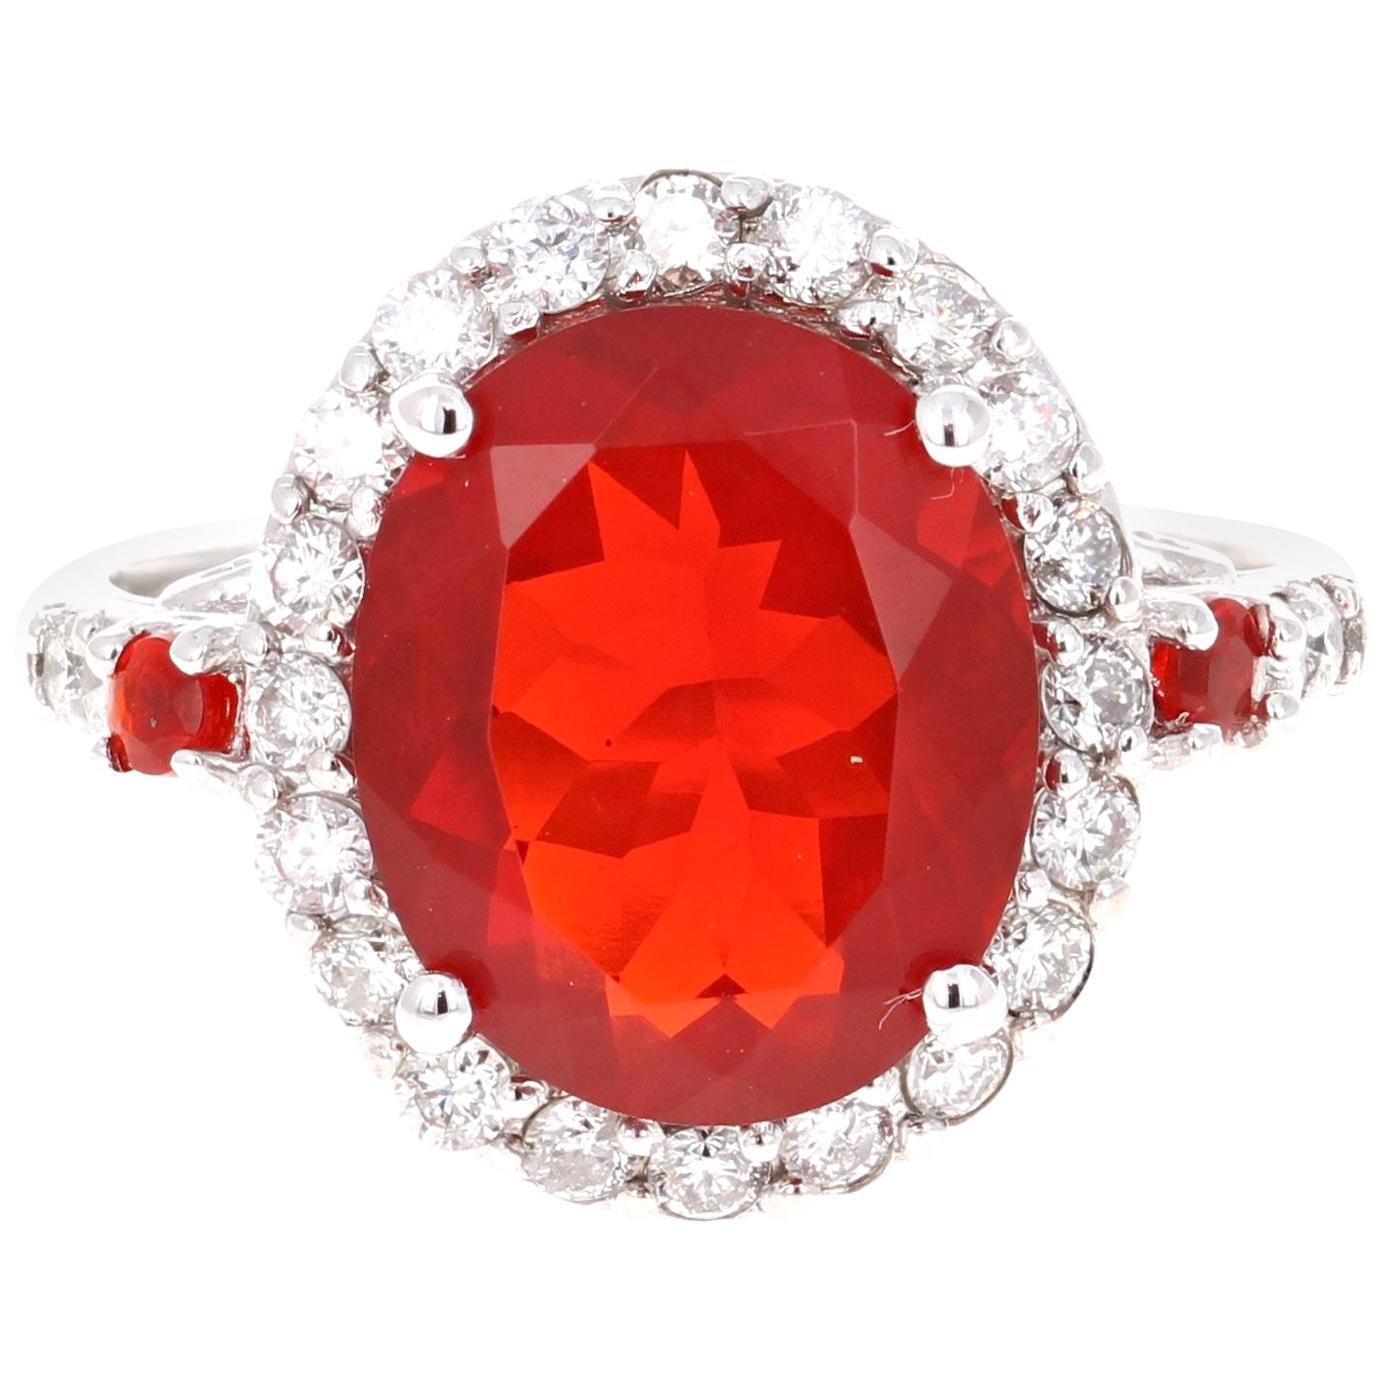 3.88 Carat Oval Cut Opal Diamond 14 Karat White Gold Bridal Ring